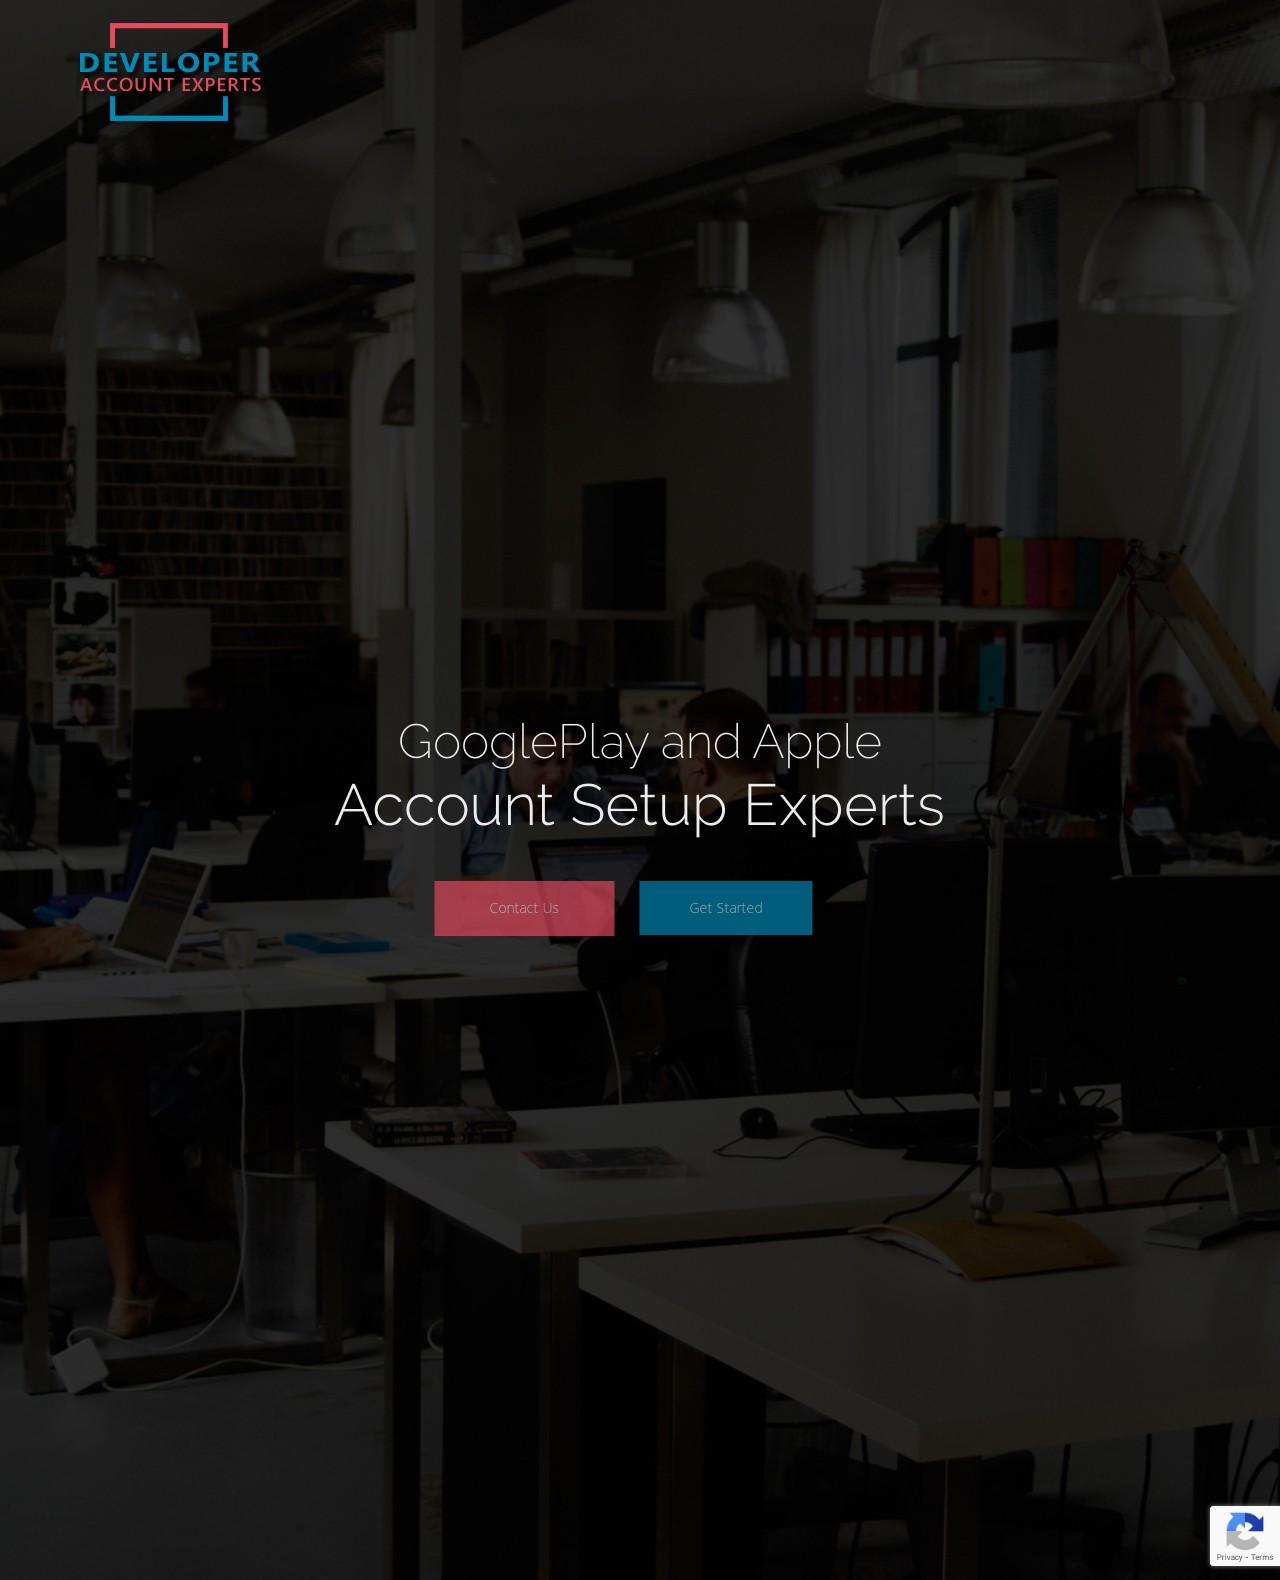 Developer Account Experts